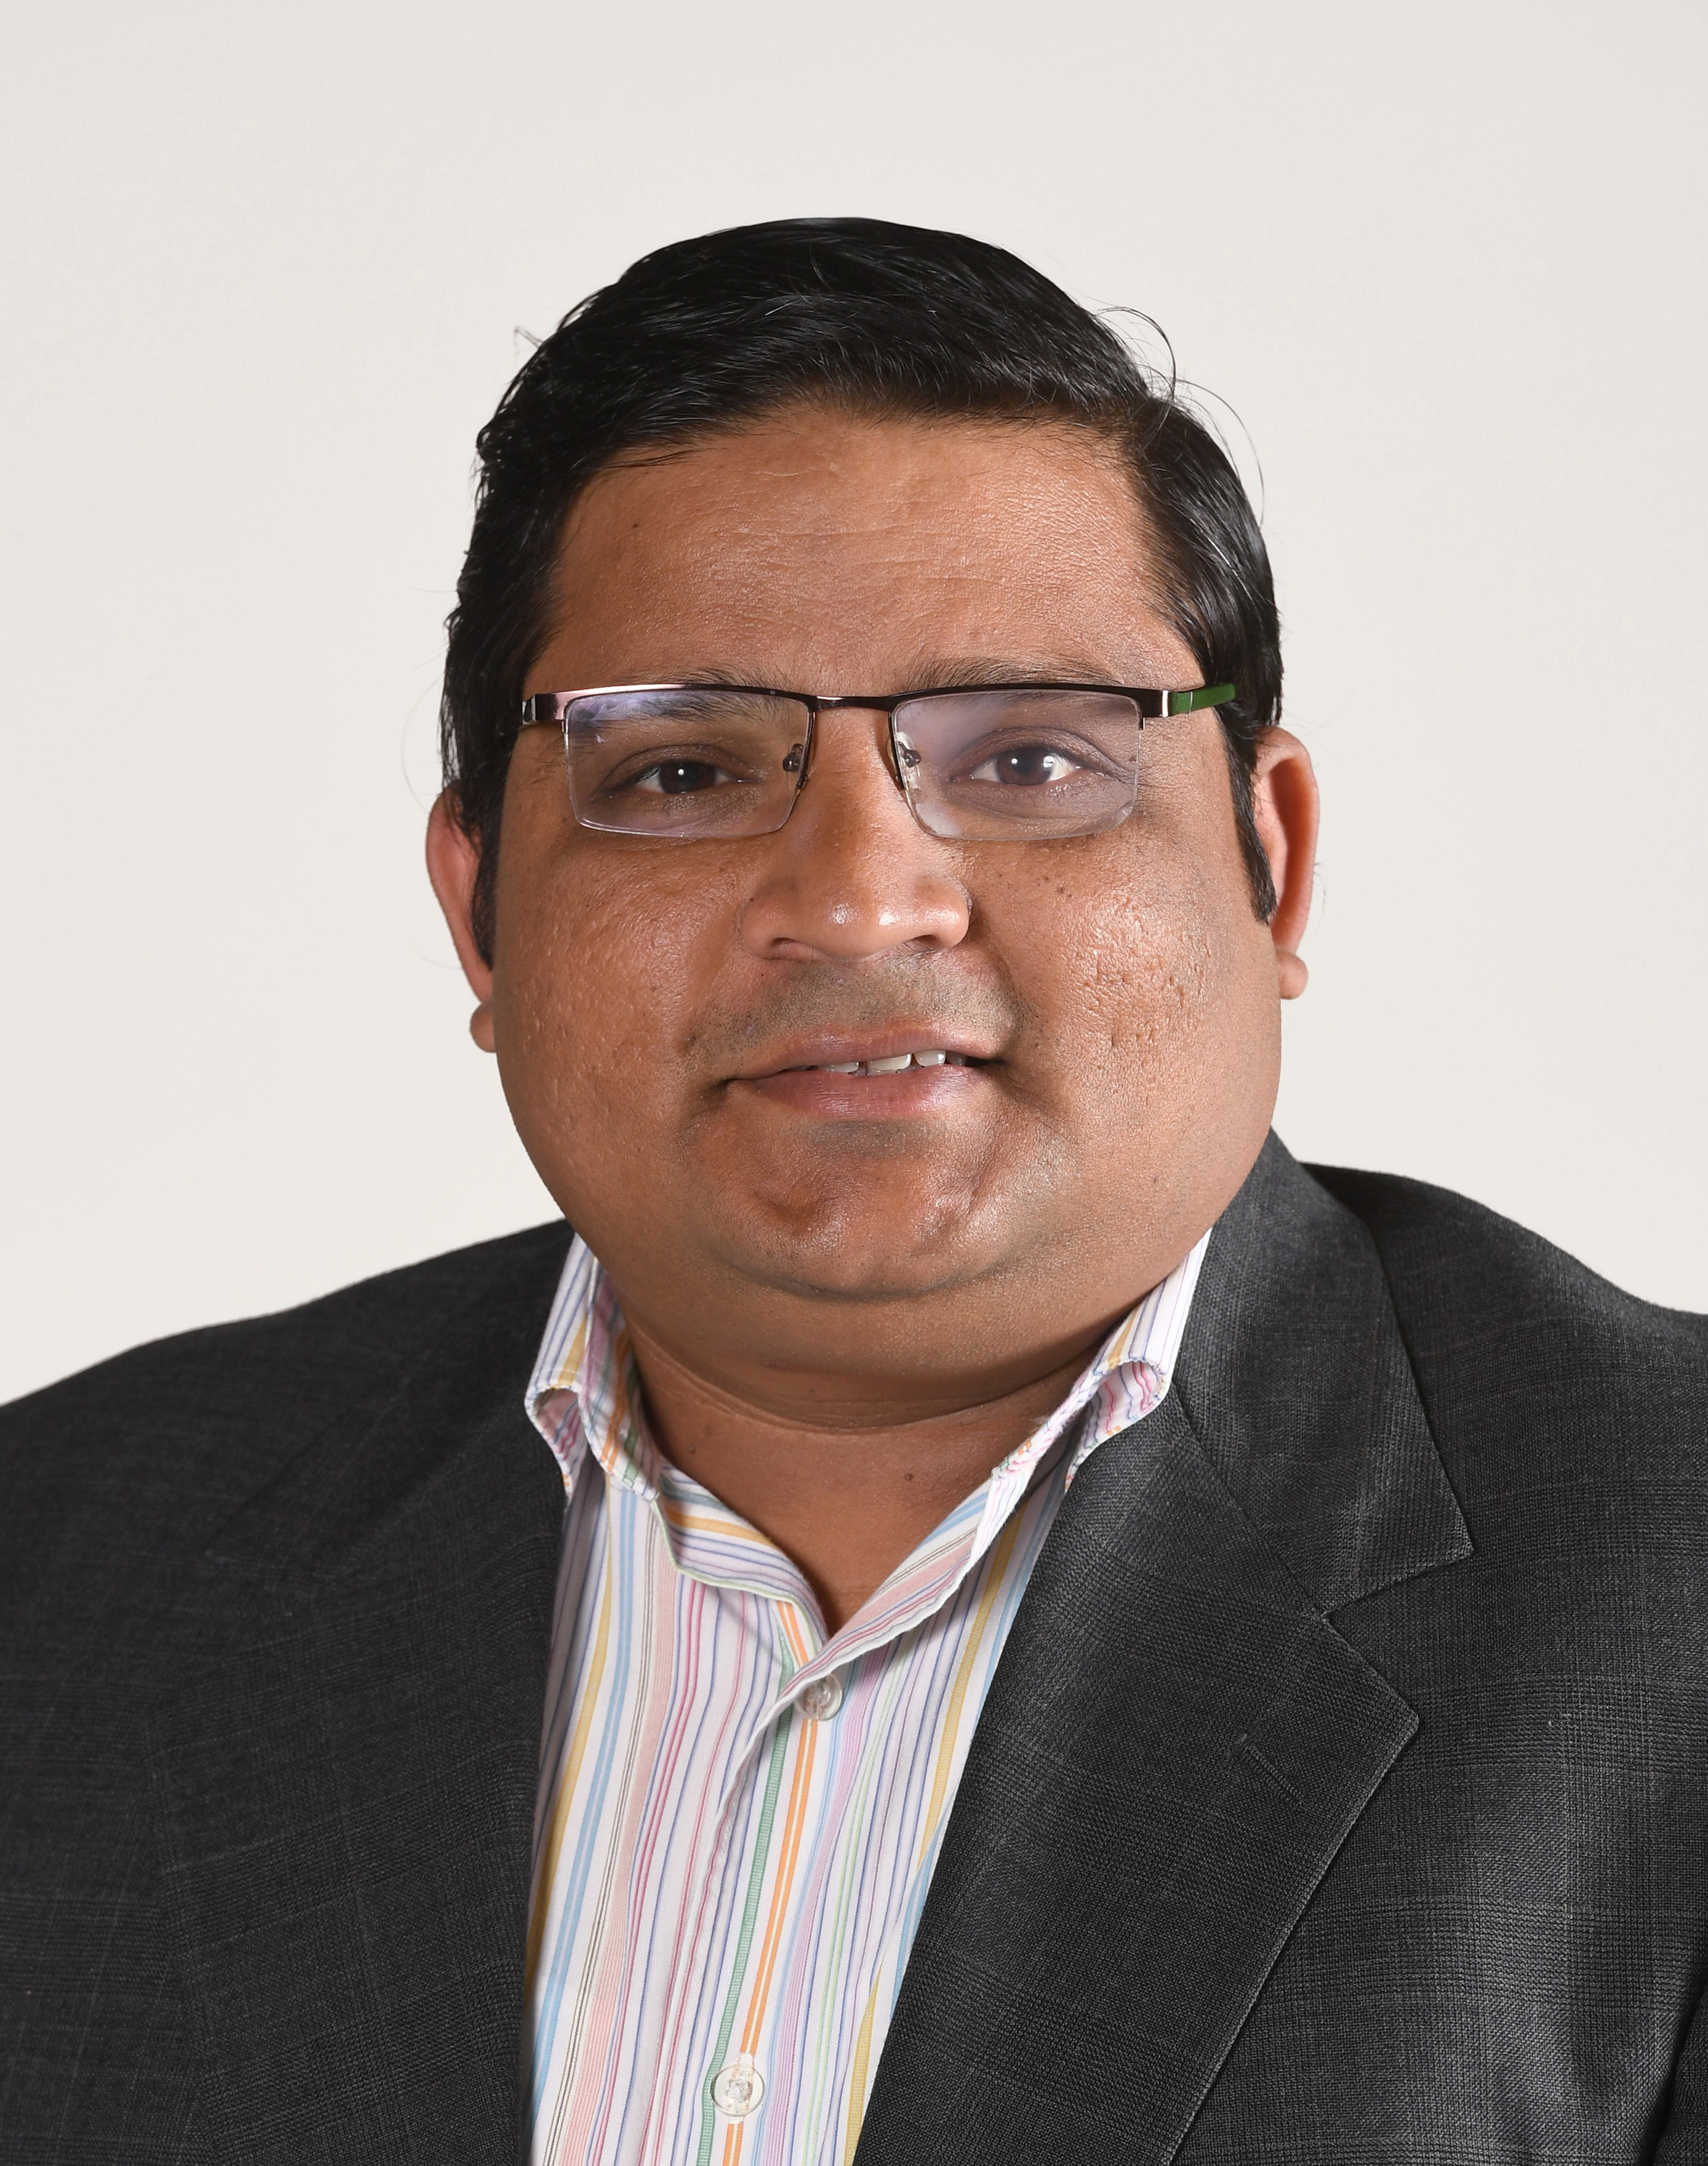 Shivendu Pratap Singh